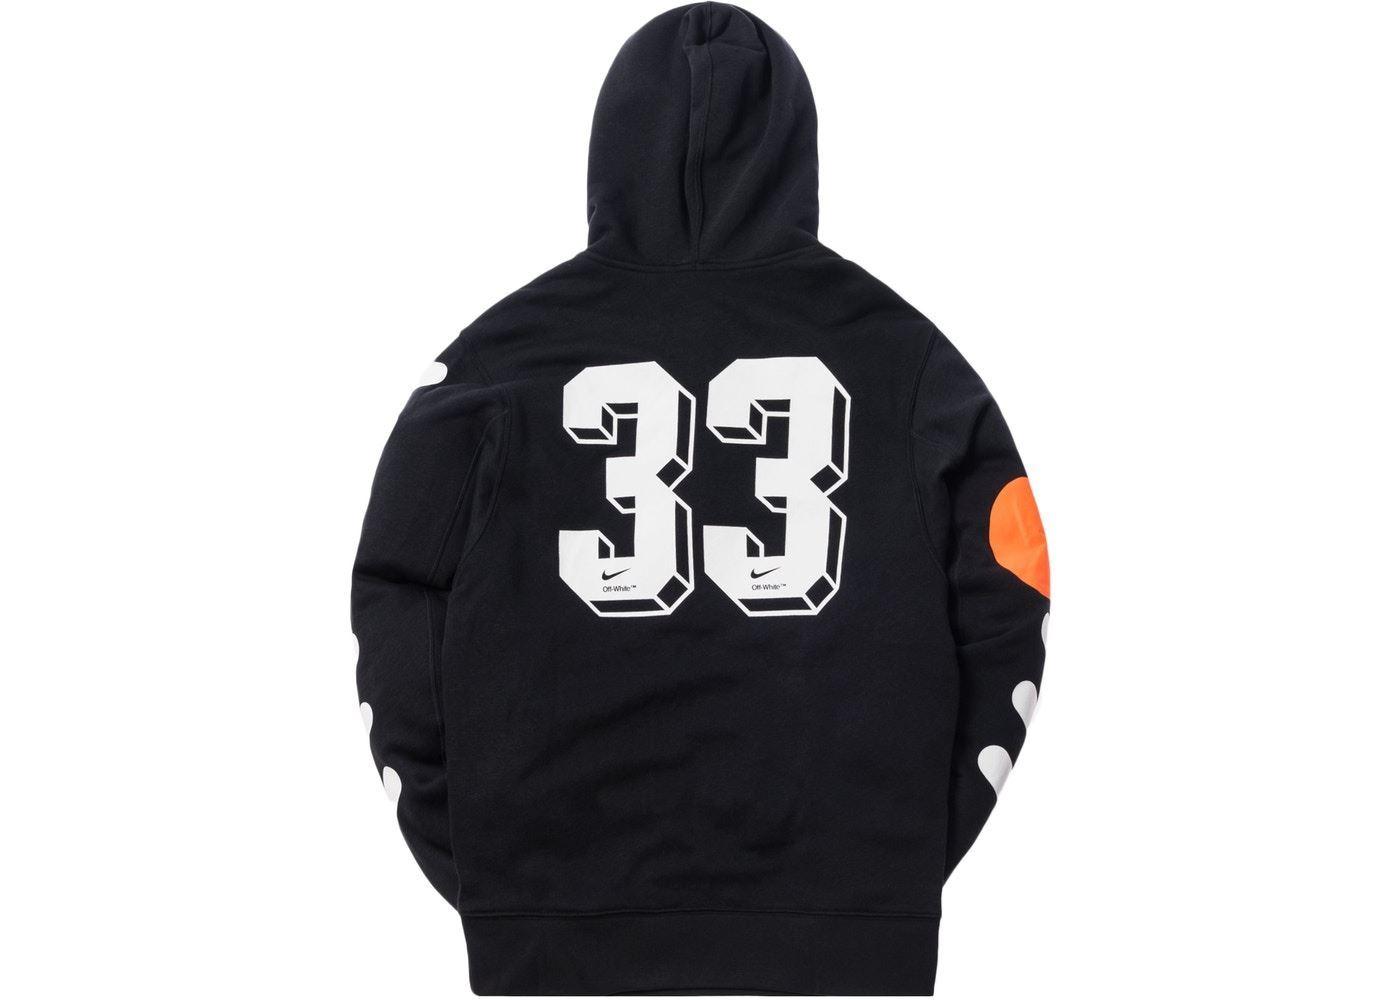 380ab52aa0 ... Picture of Nikelab x OFF-WHITE Mercurial NRG X Hoodie Black